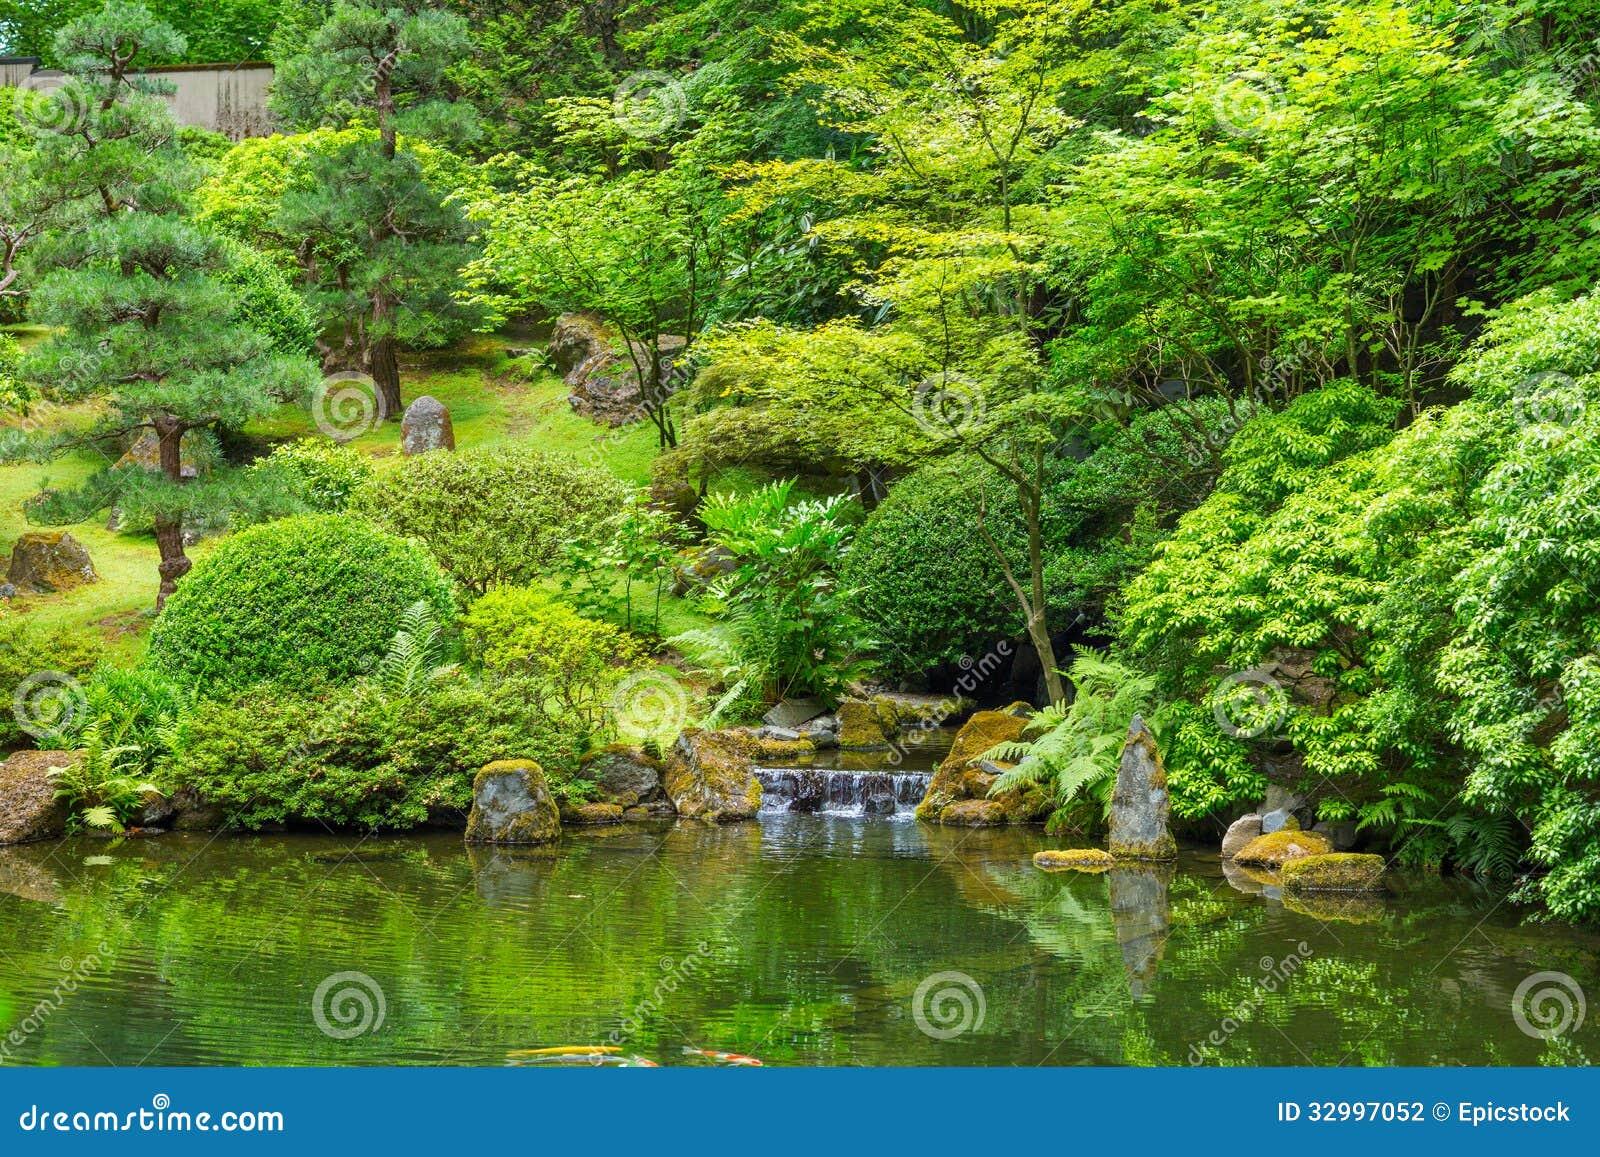 astonishing beautiful zen garden | Beautiful Japanese Garden stock photo. Image of serenity ...